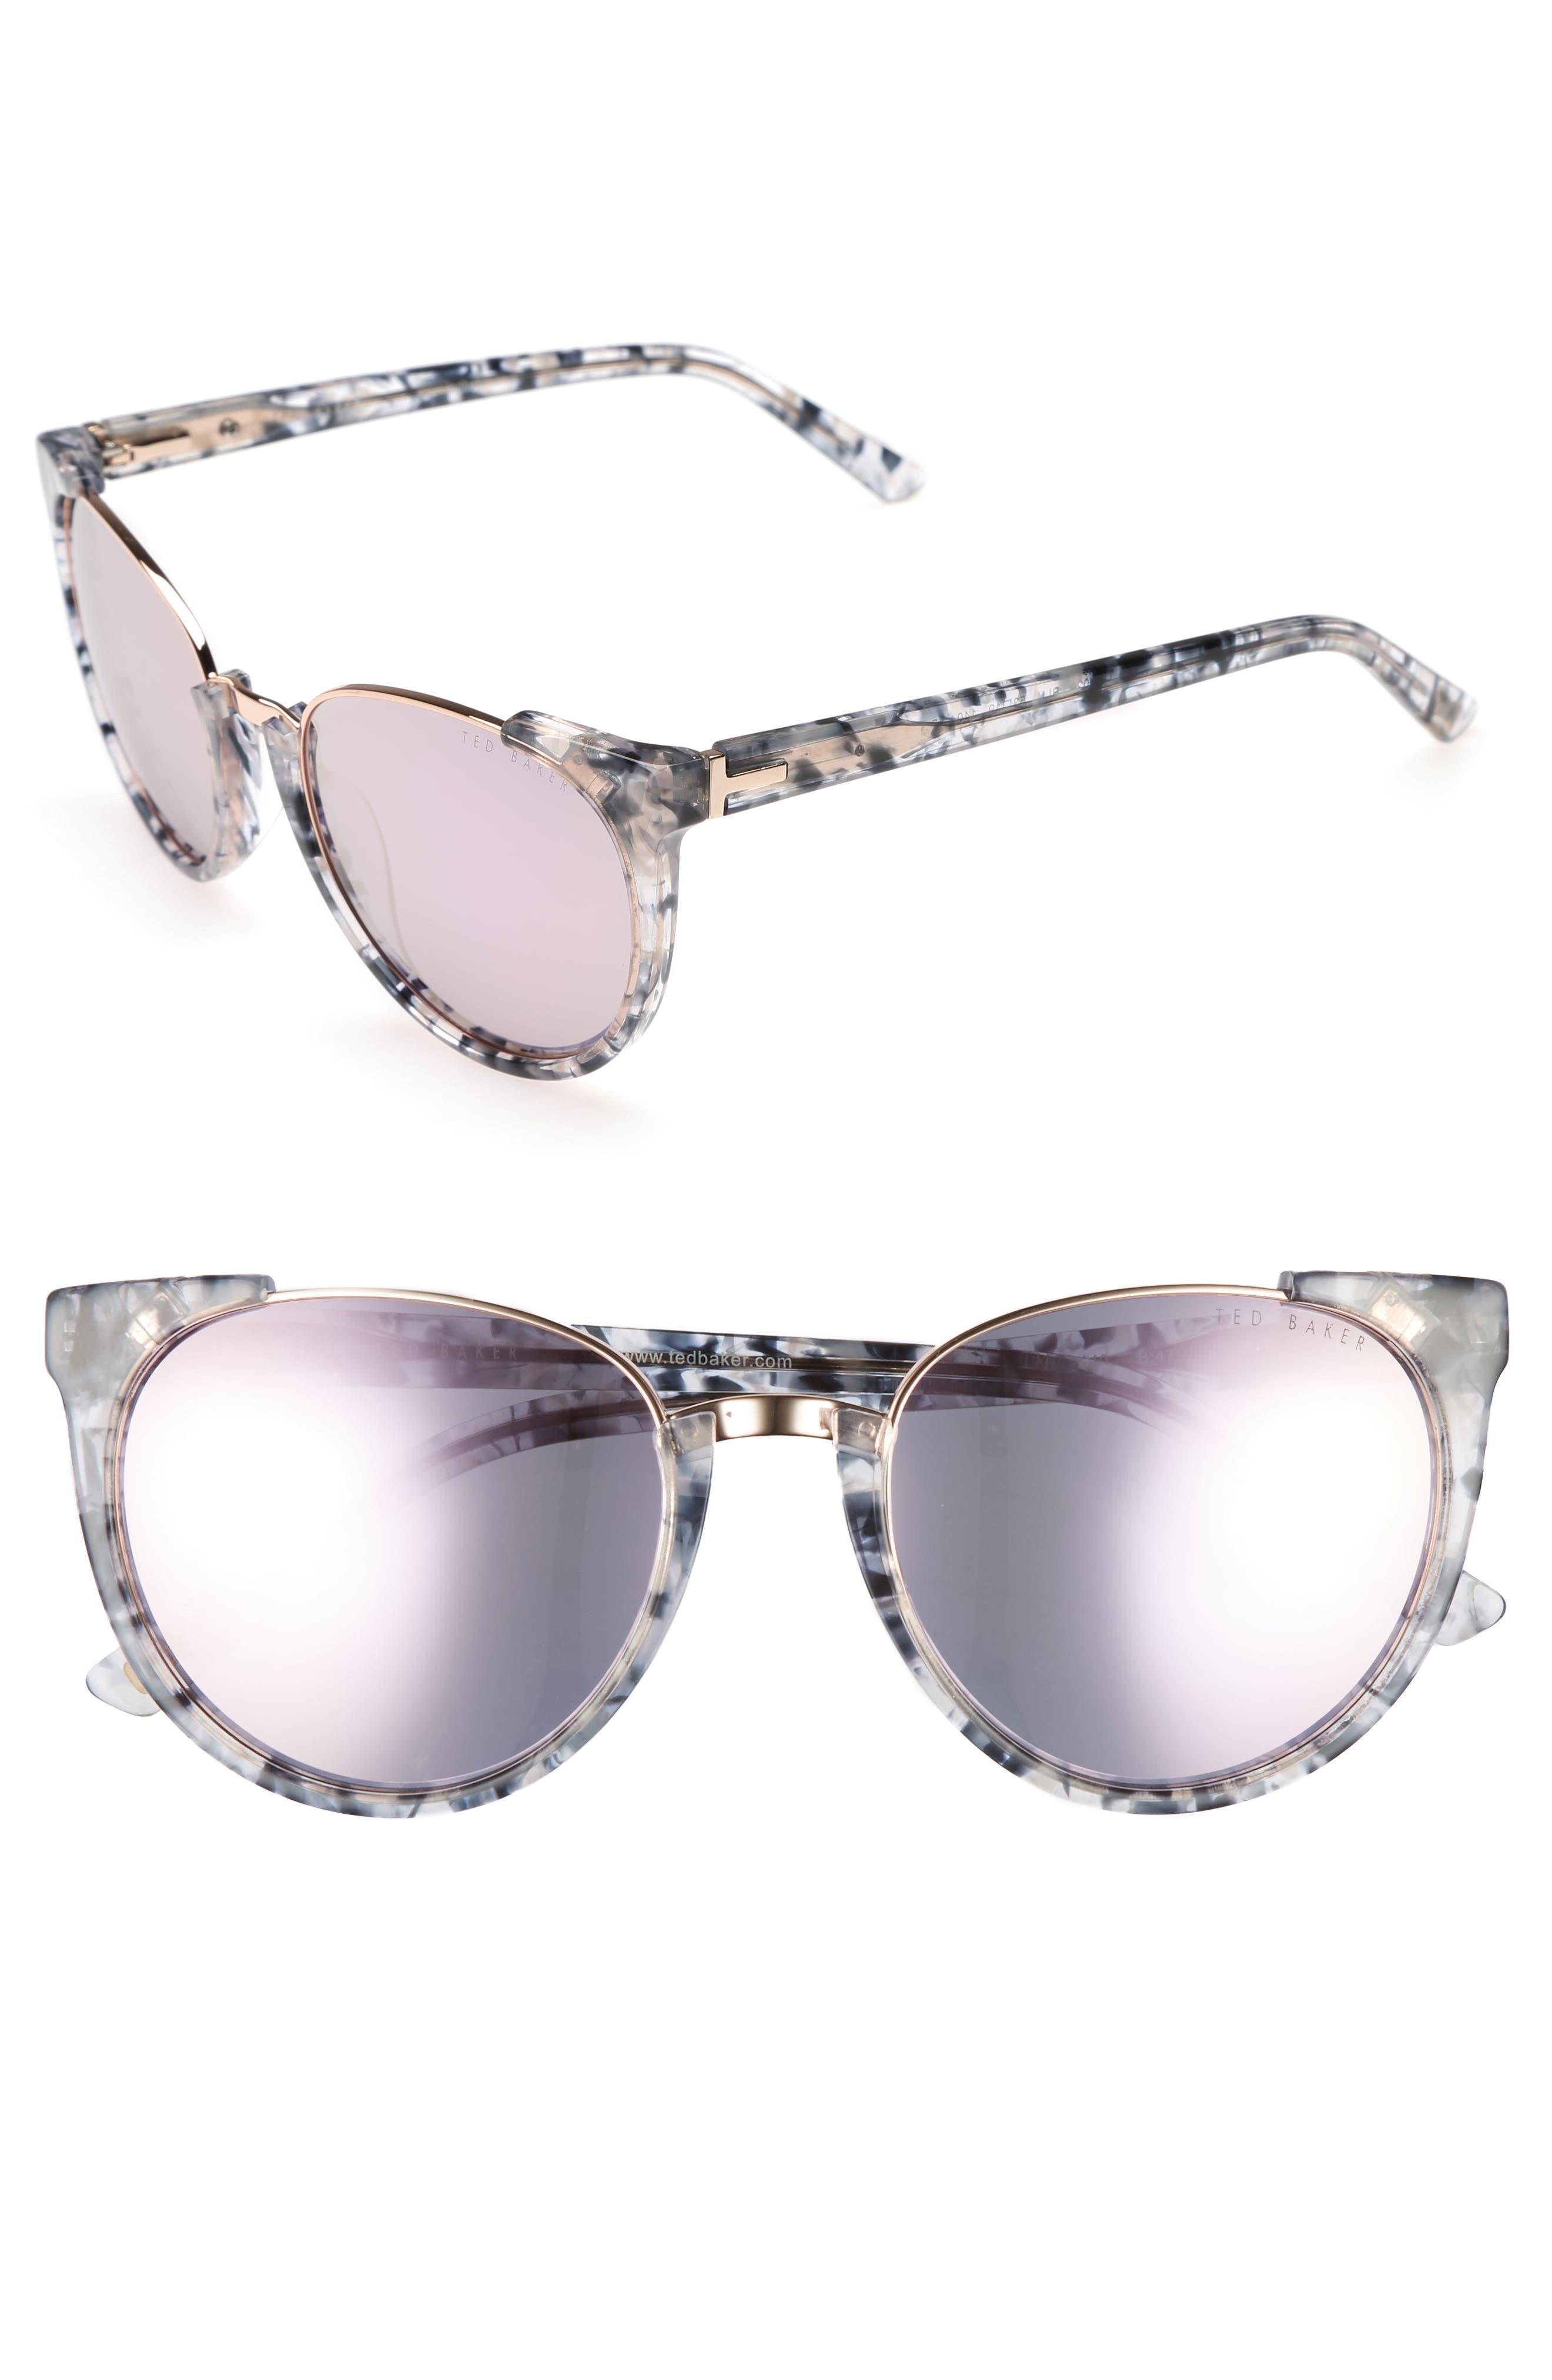 53mm Modified Oval Sunglasses,                         Main,                         color, Blue